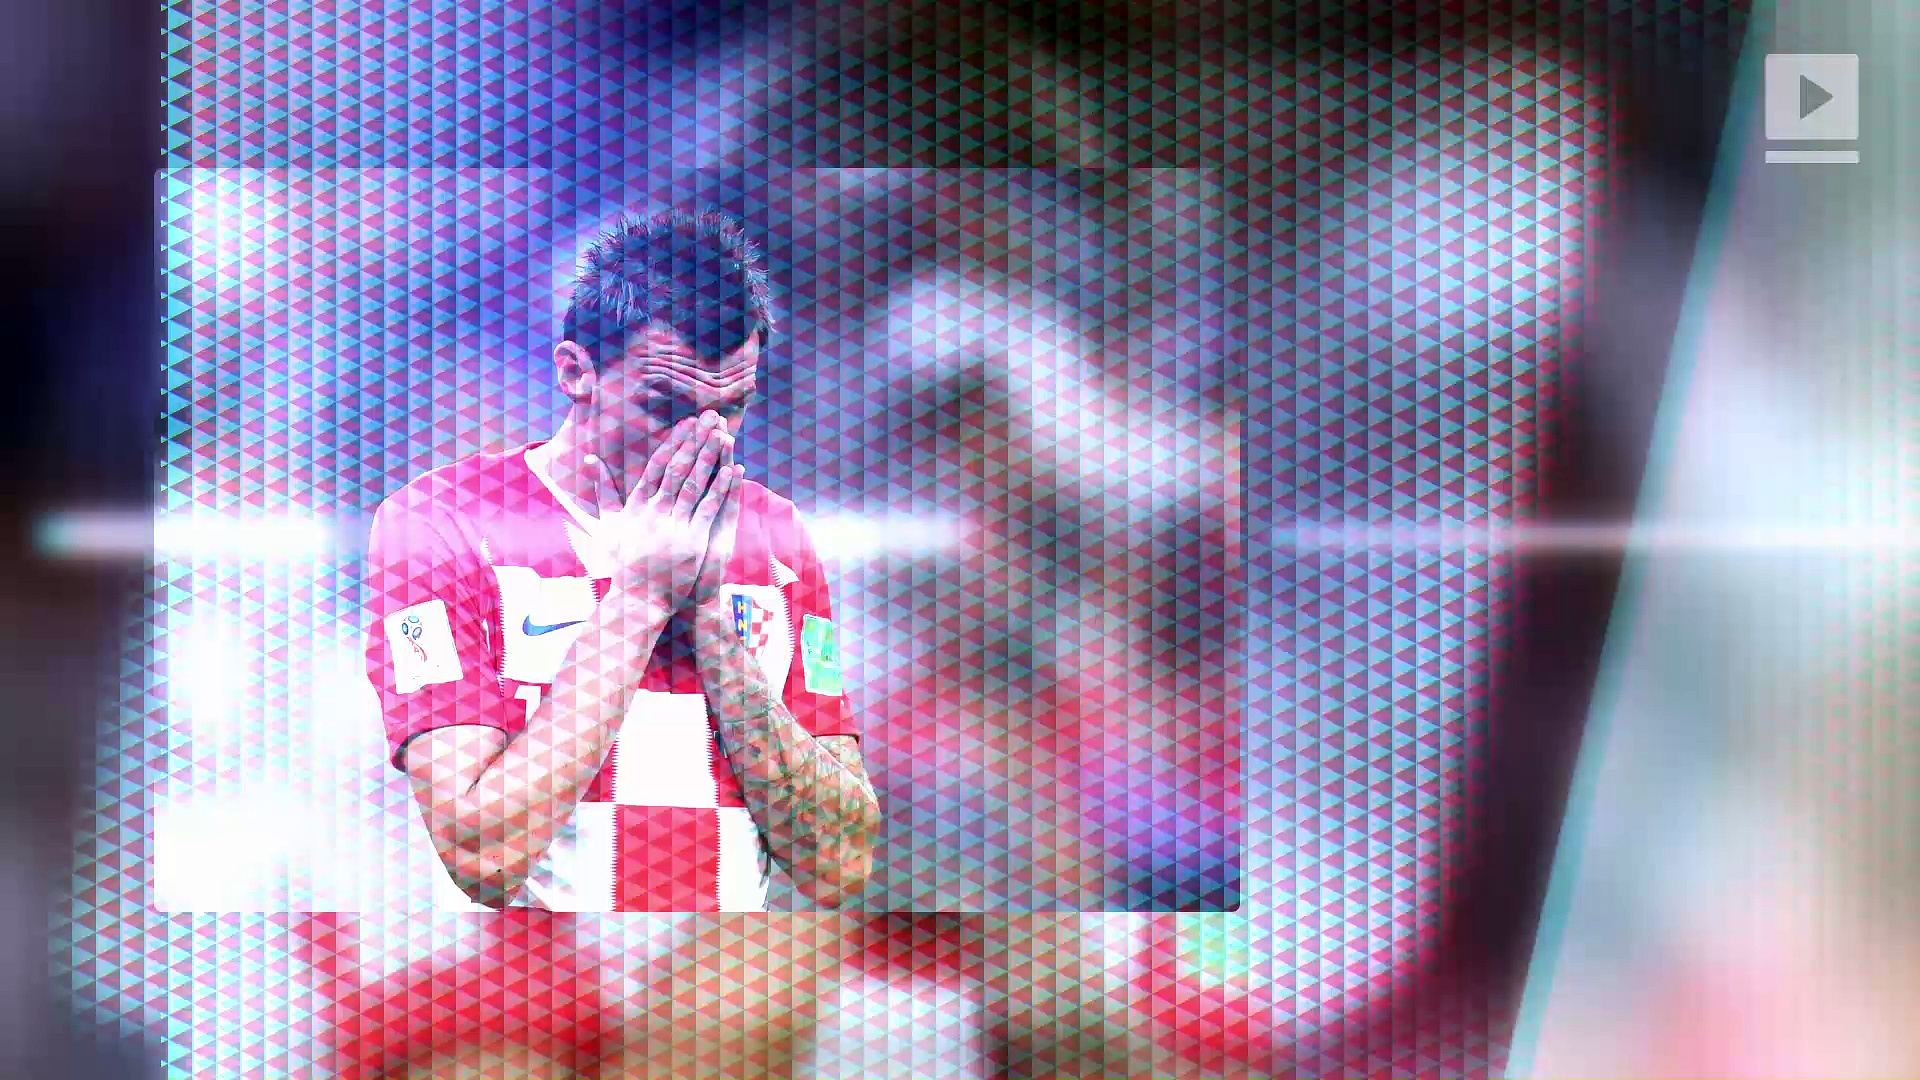 France Wins World Cup 2018 Against Croatia